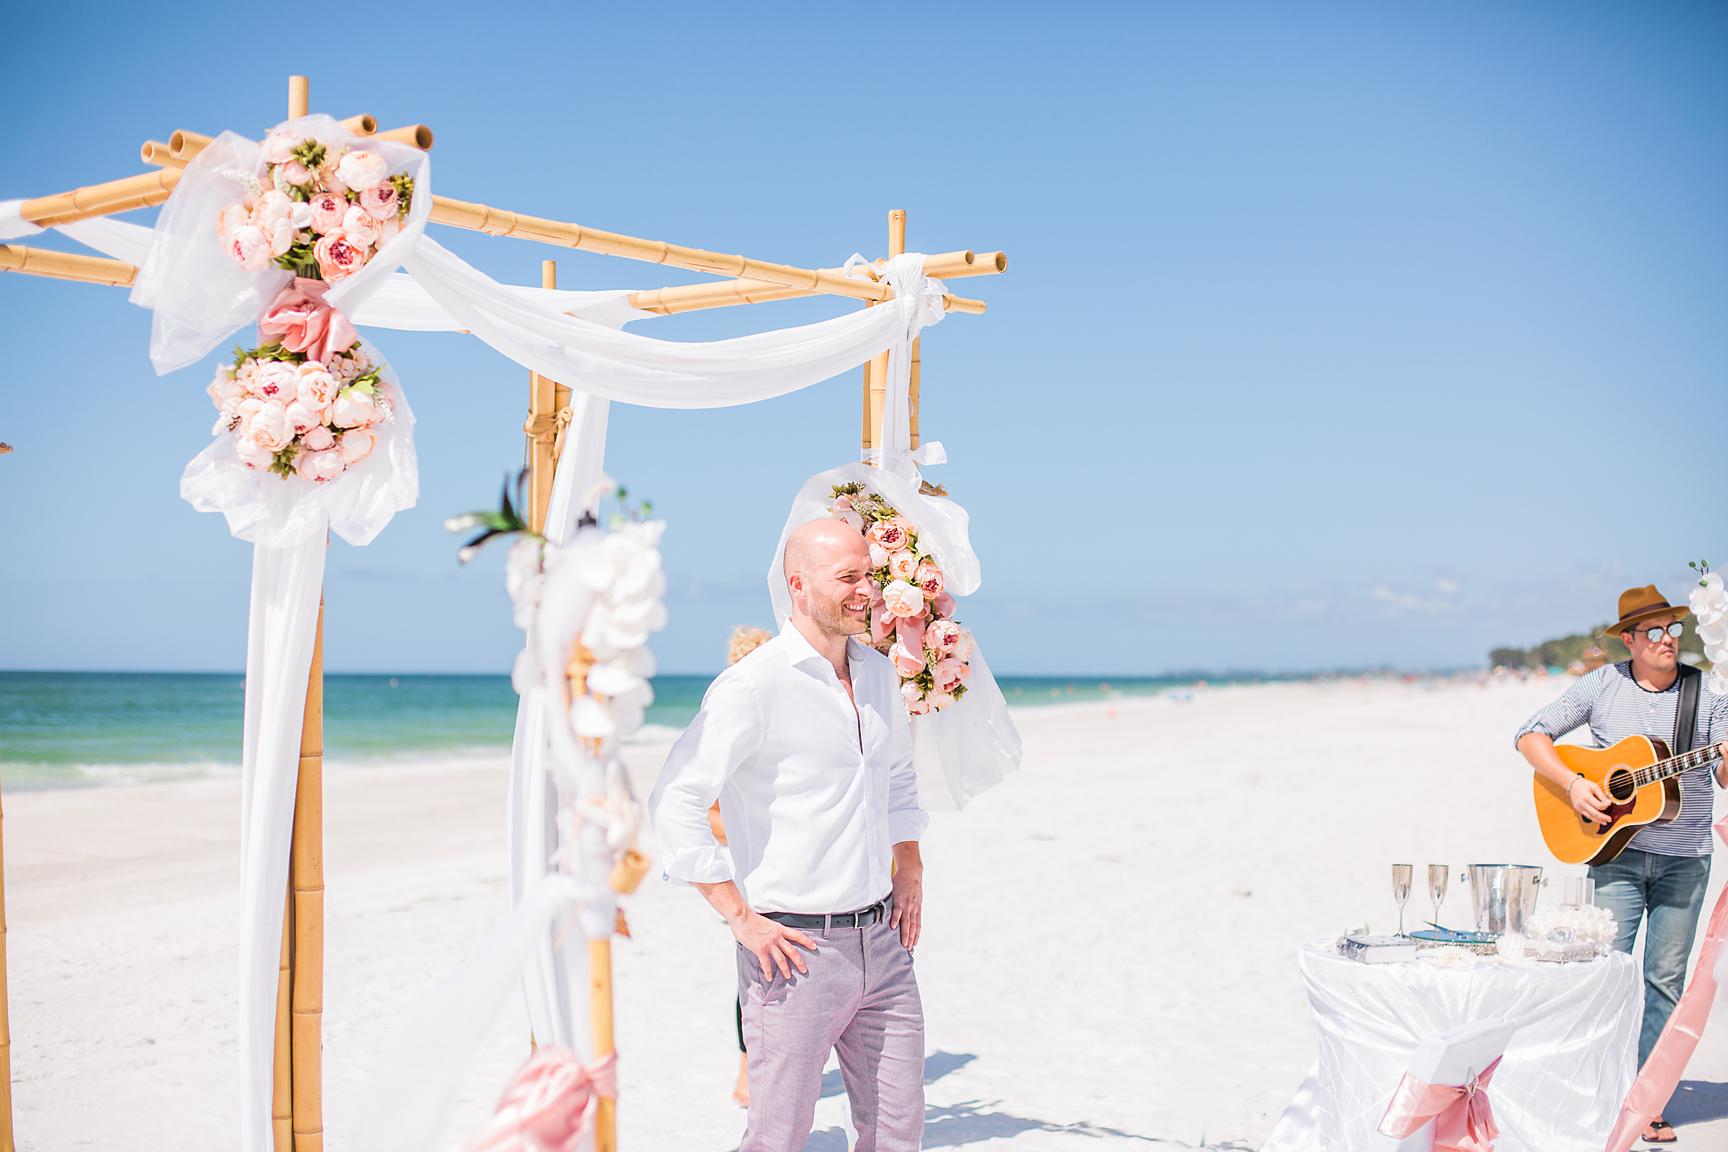 Luise + Daniel - Anna Maria Island Wedding Photography - Emily & Co 5.jpg